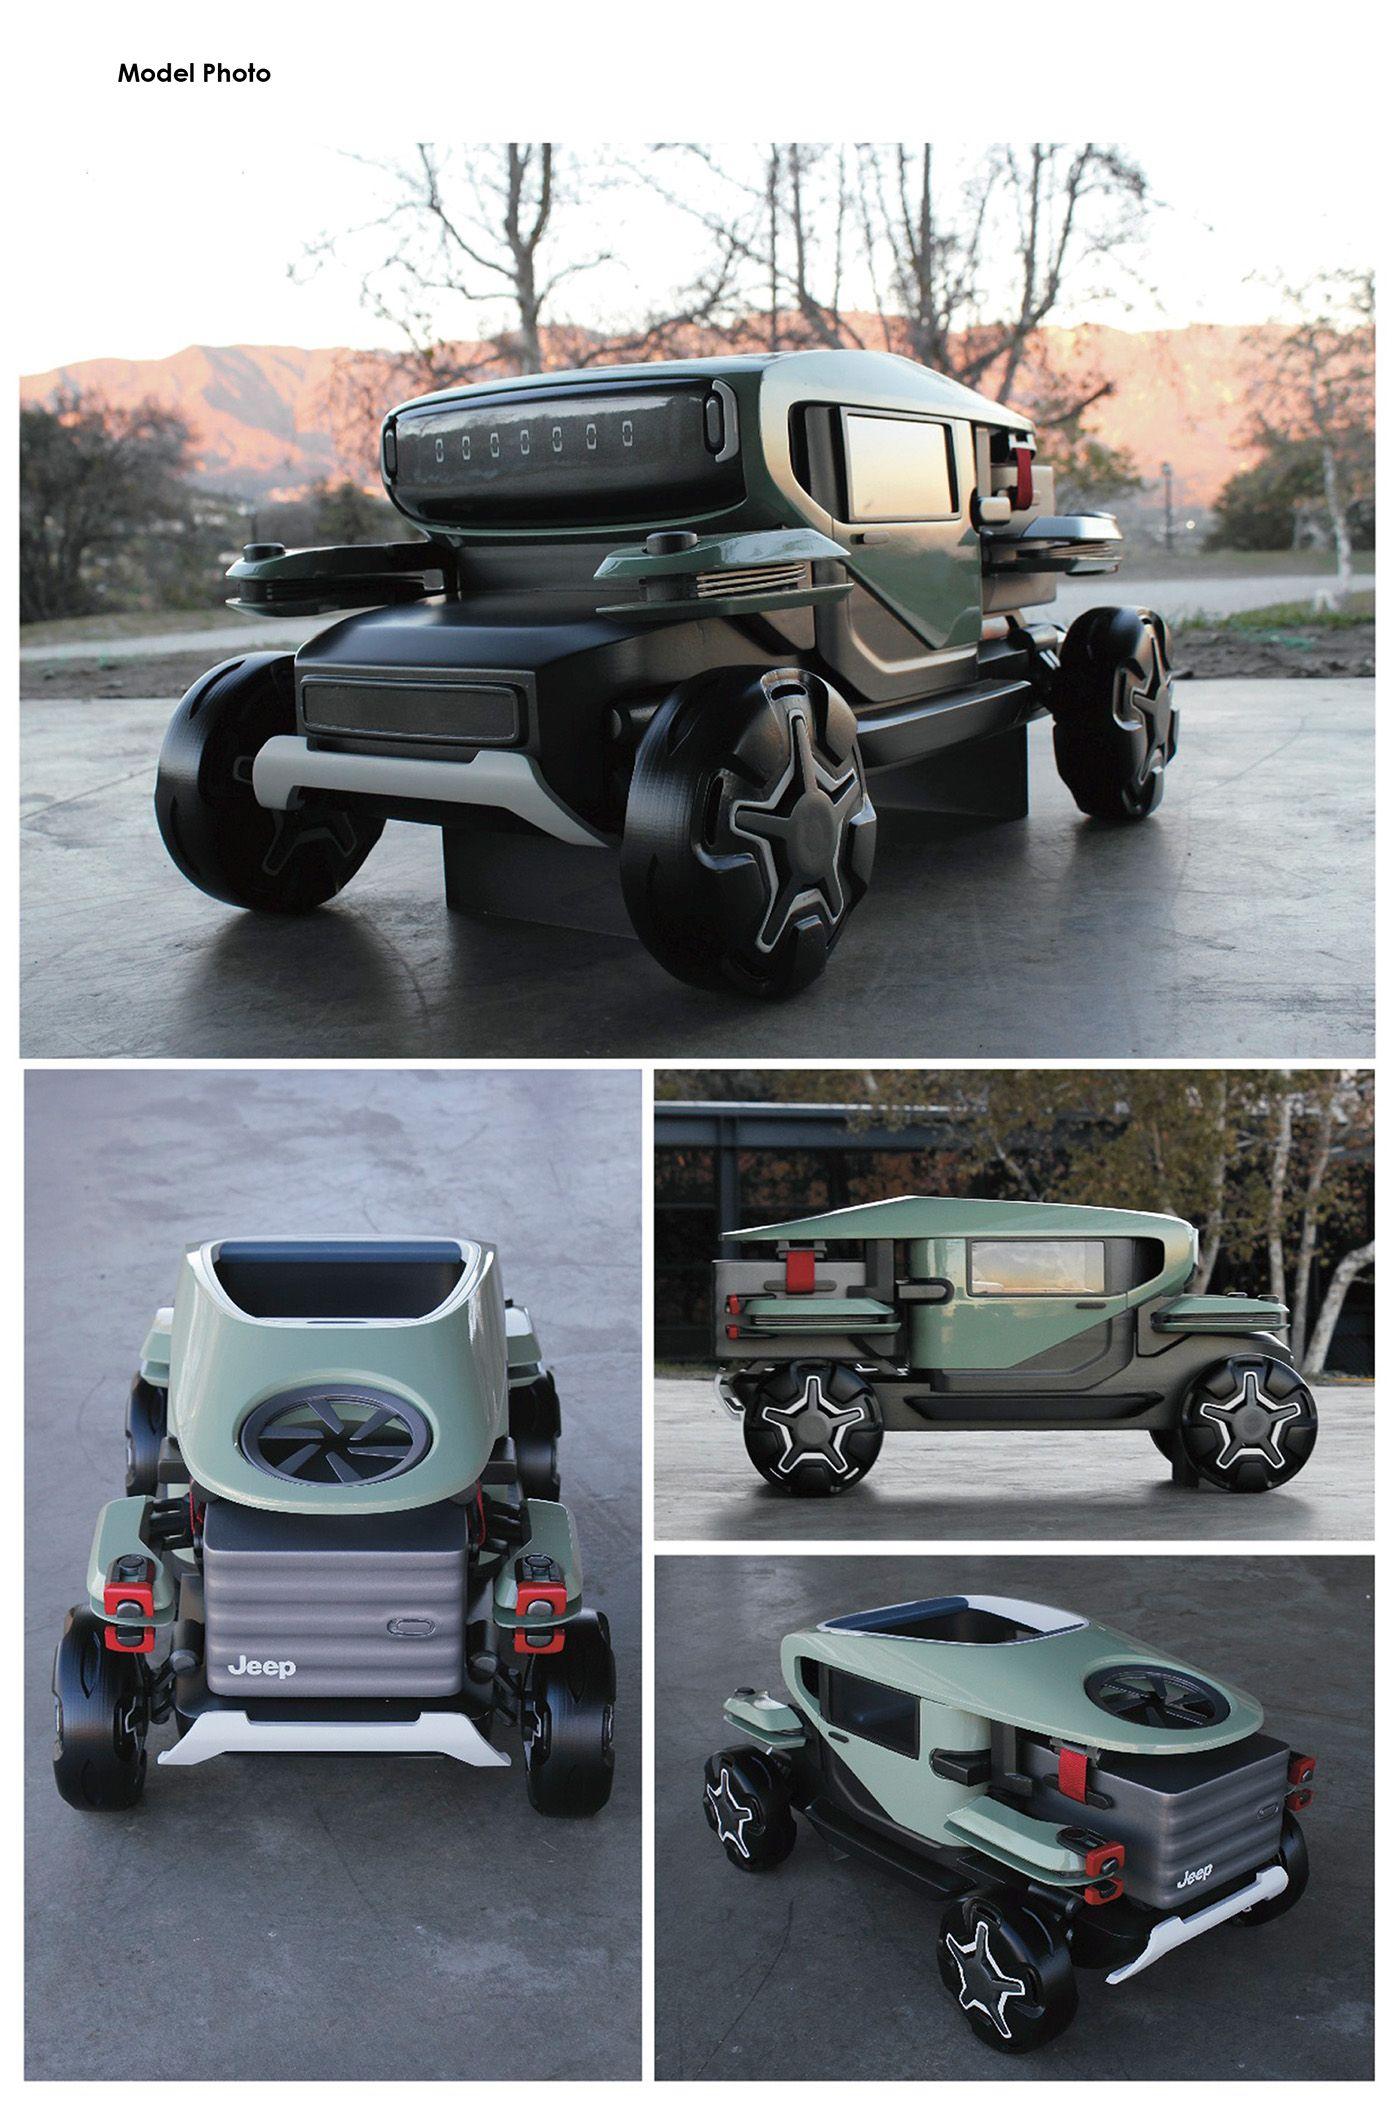 Jeep sharing autonomous on behance